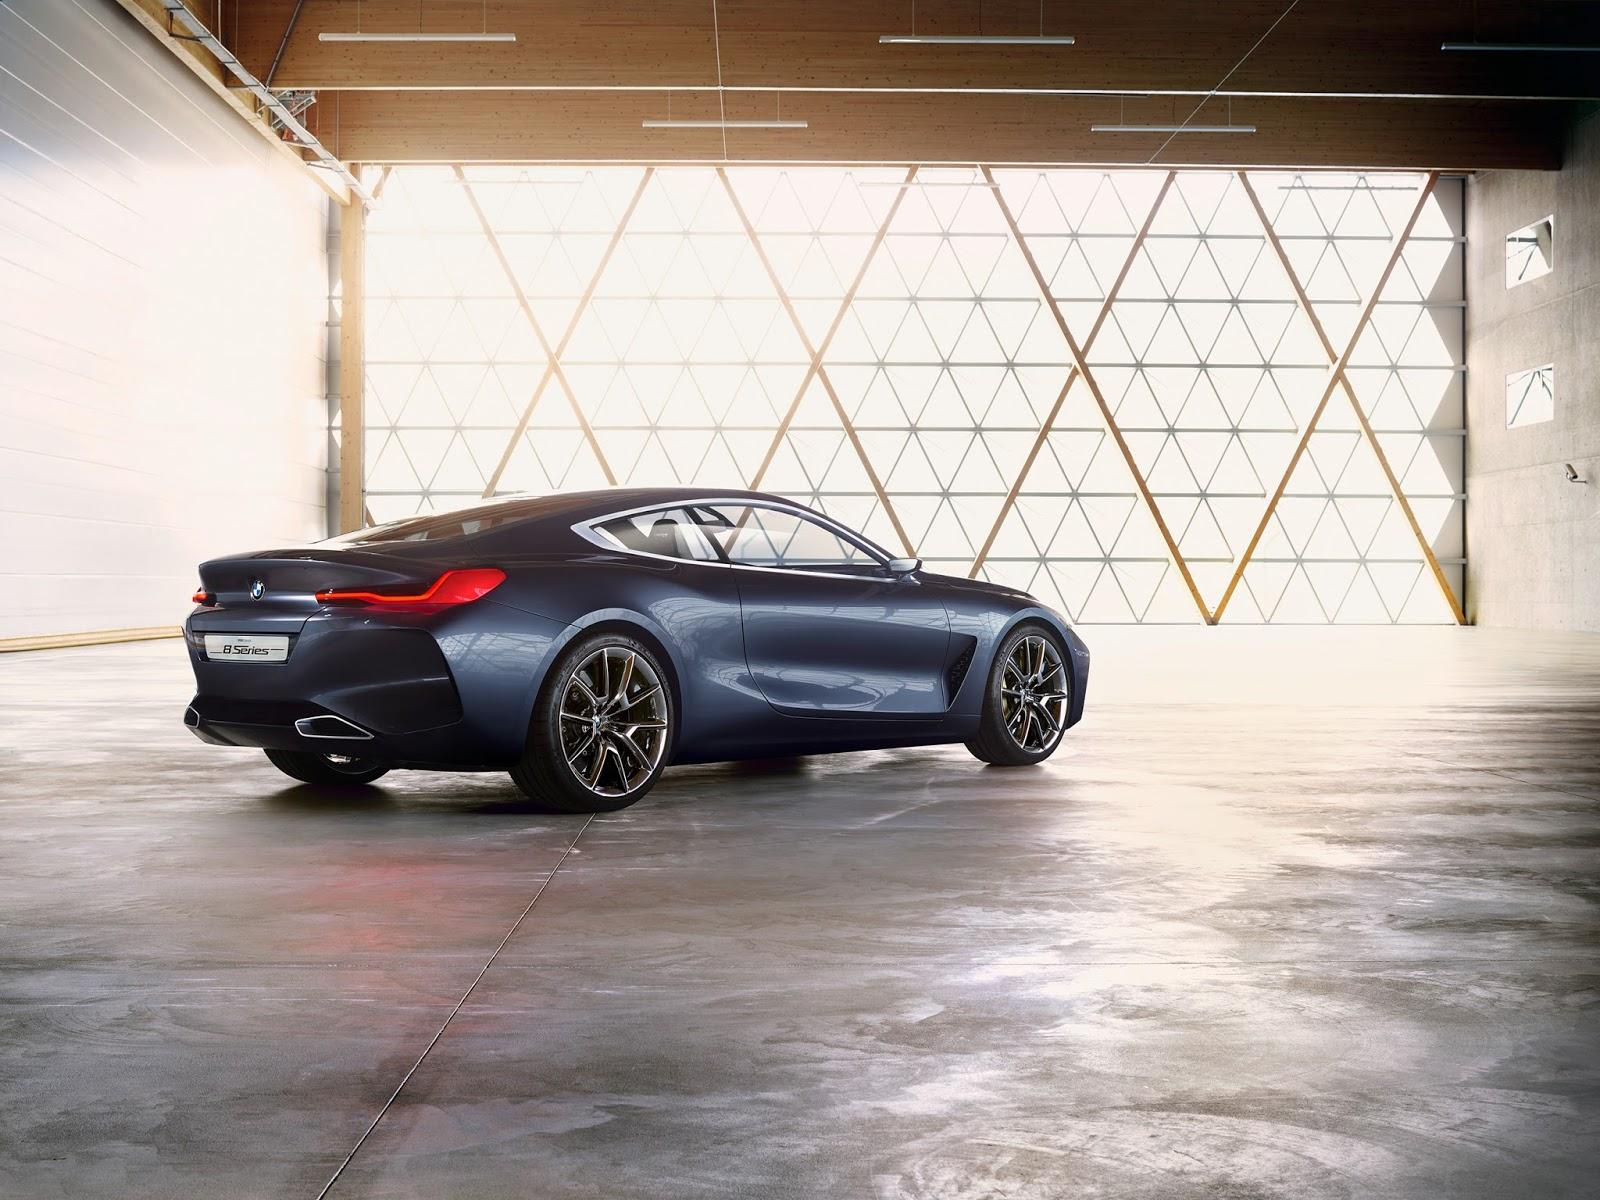 P90260635 highRes bmw concept 8 series Η BMW Σειρά 8 Coupe είναι η πεμπτουσία των μελλοντικών σπορ αυτοκινήτων BMW, BMW 8, BMW Concept, BMW Concept 8 Series, COUPE, dream car